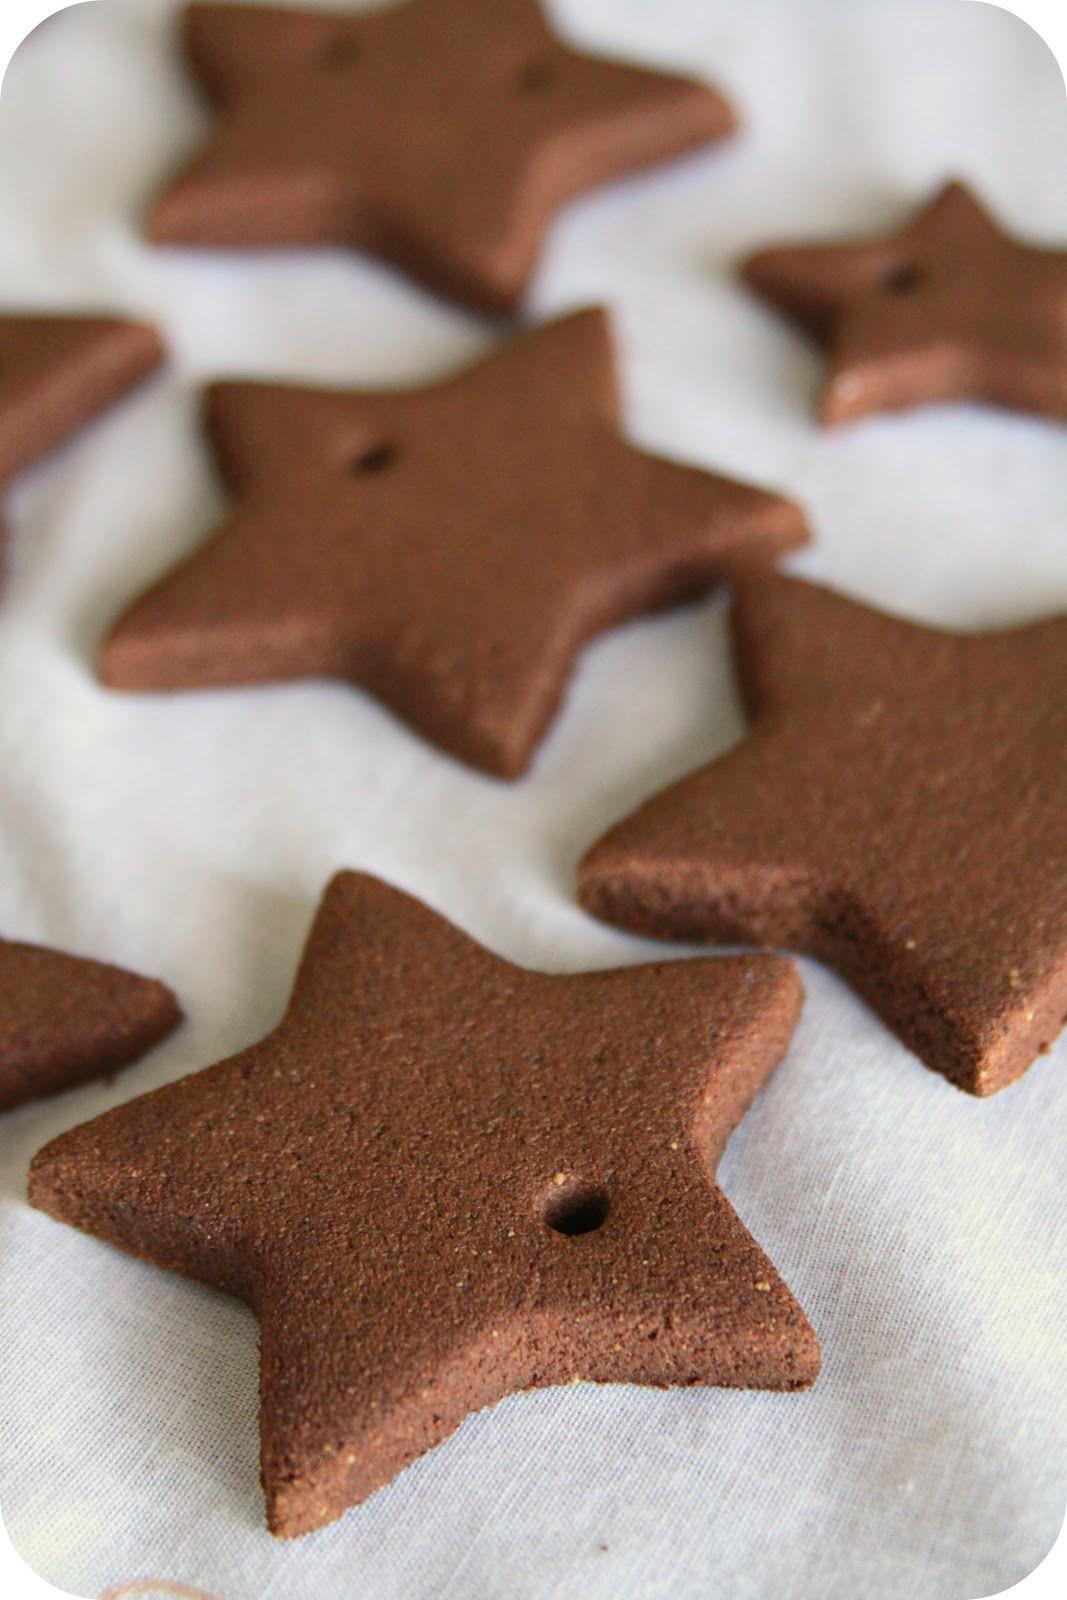 Diy cinnamon ornaments 4 oz or 1 cup cinnamon 1 for 1 table spoon oz